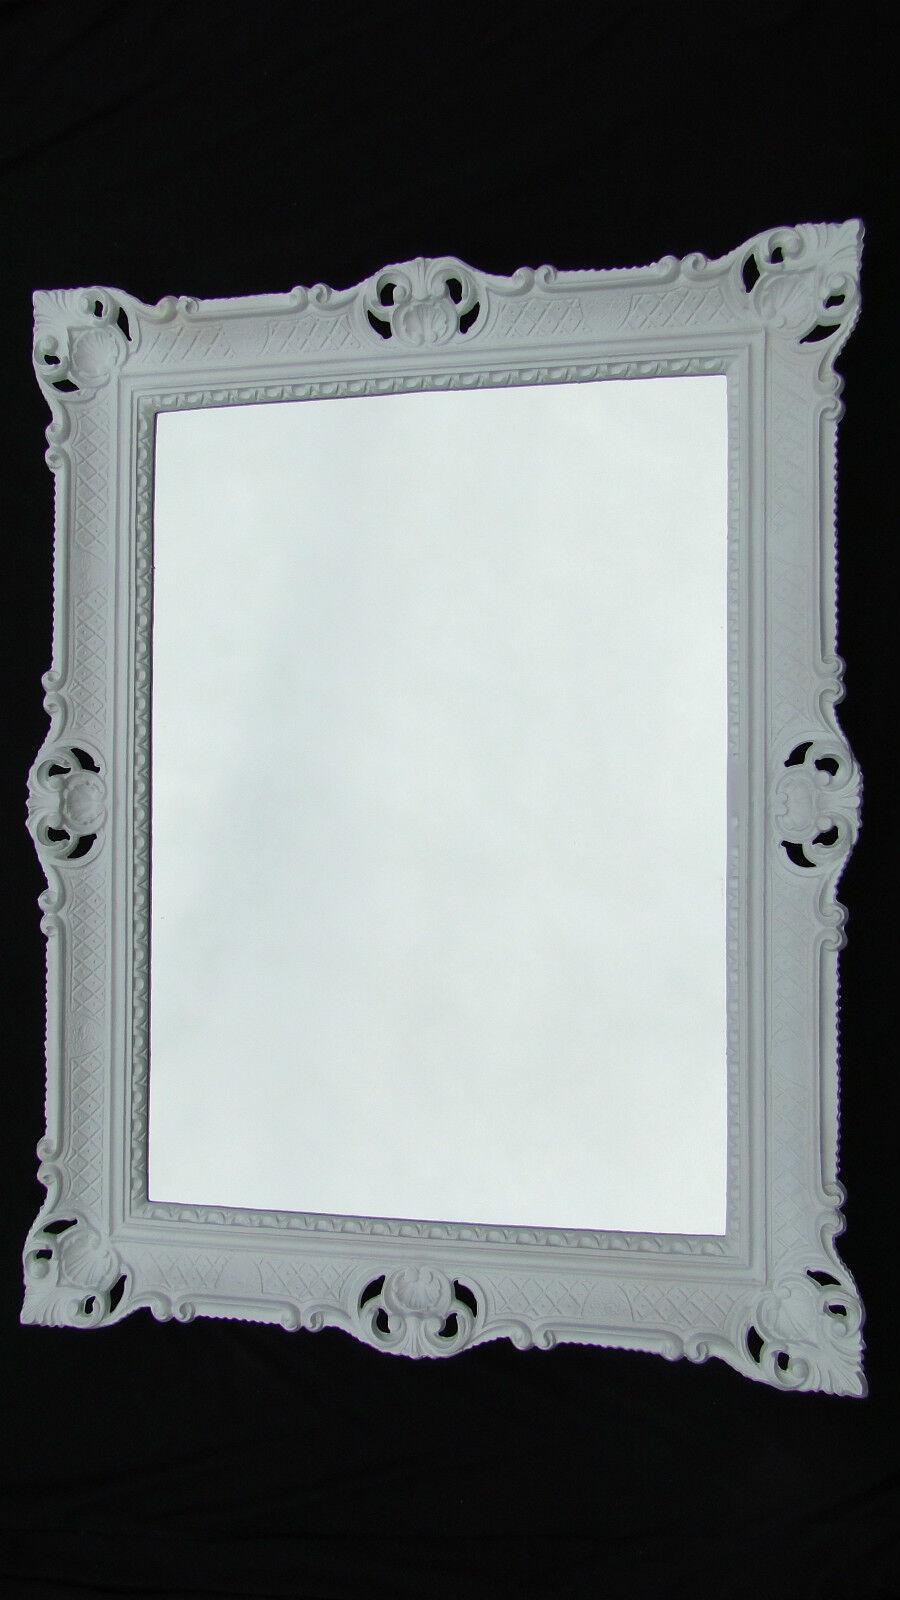 Marco barroco de cuadro grande 90x70 foto-bodas marco blanco barroco Marco rectangular con vidrio fc3b65